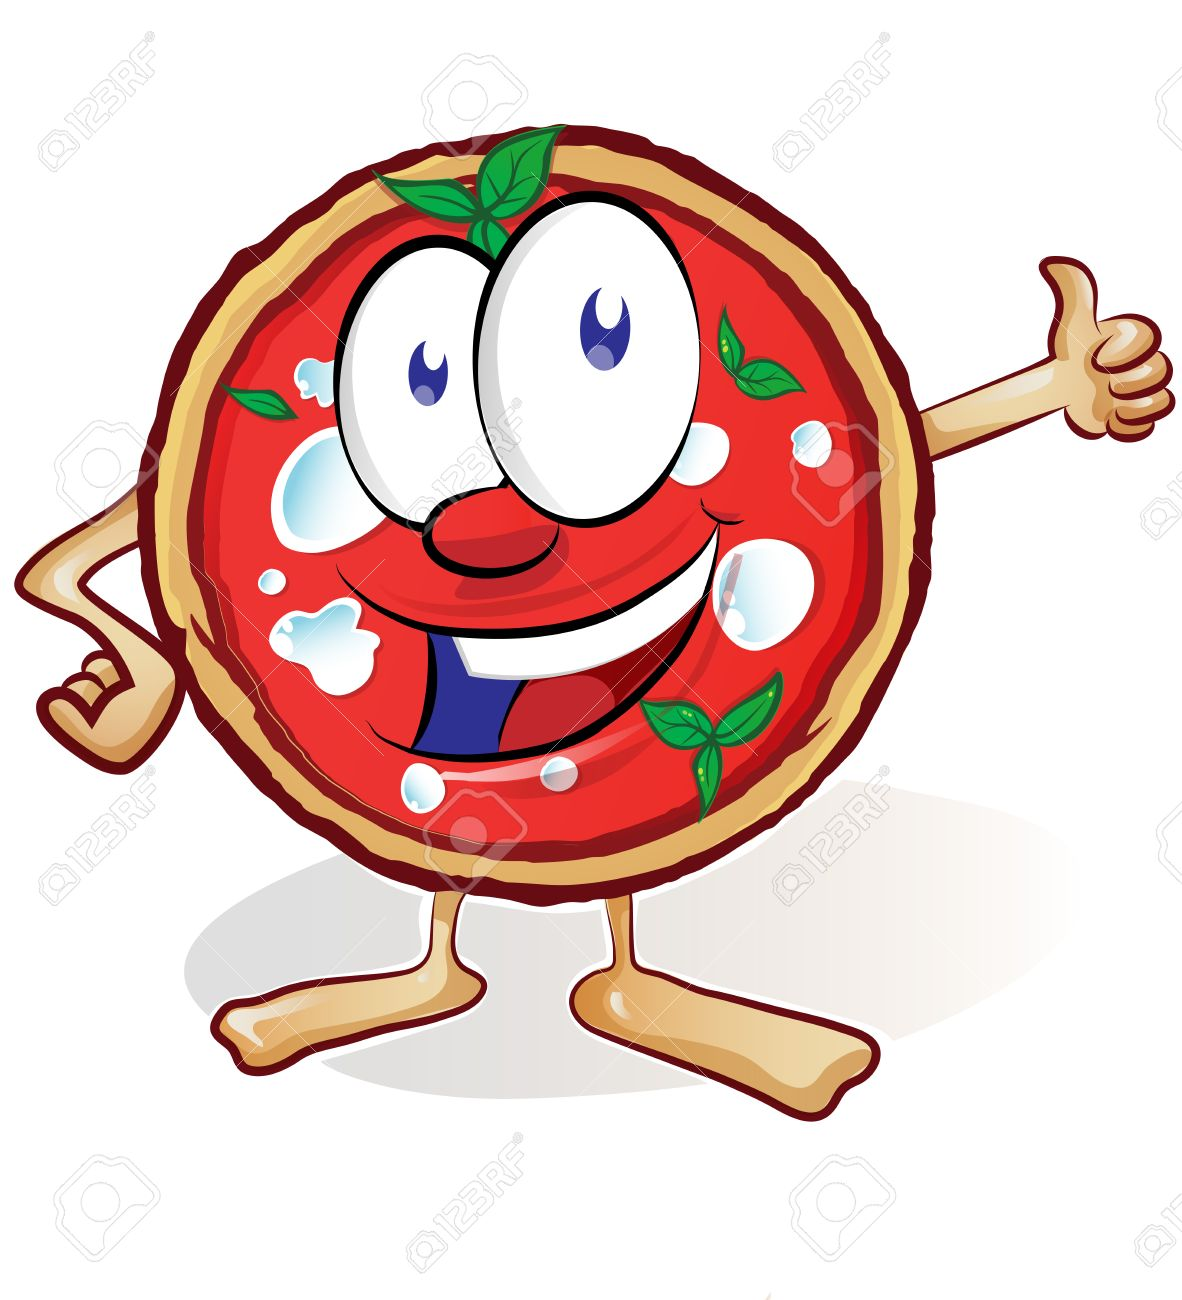 1182x1300 Fun Pizza Cartoon With Thumb Up Royalty Free Cliparts, Vectors